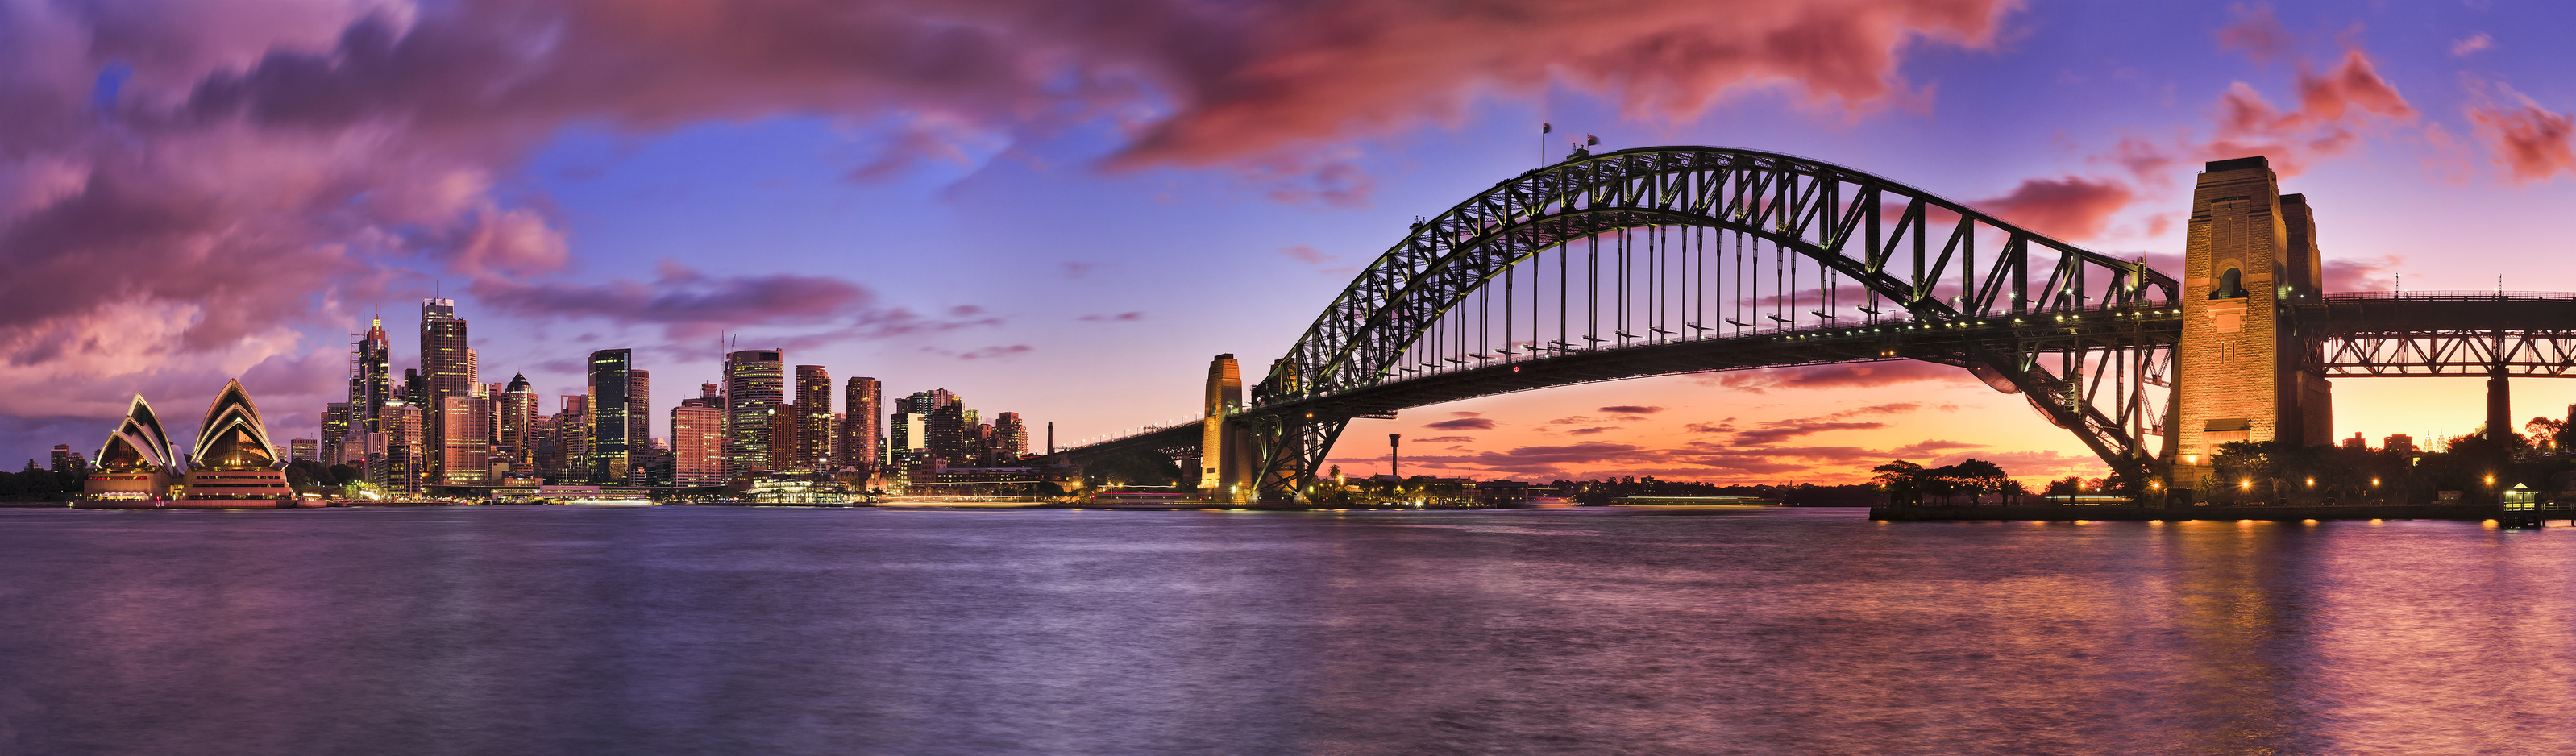 Visiting Sydney, Australia